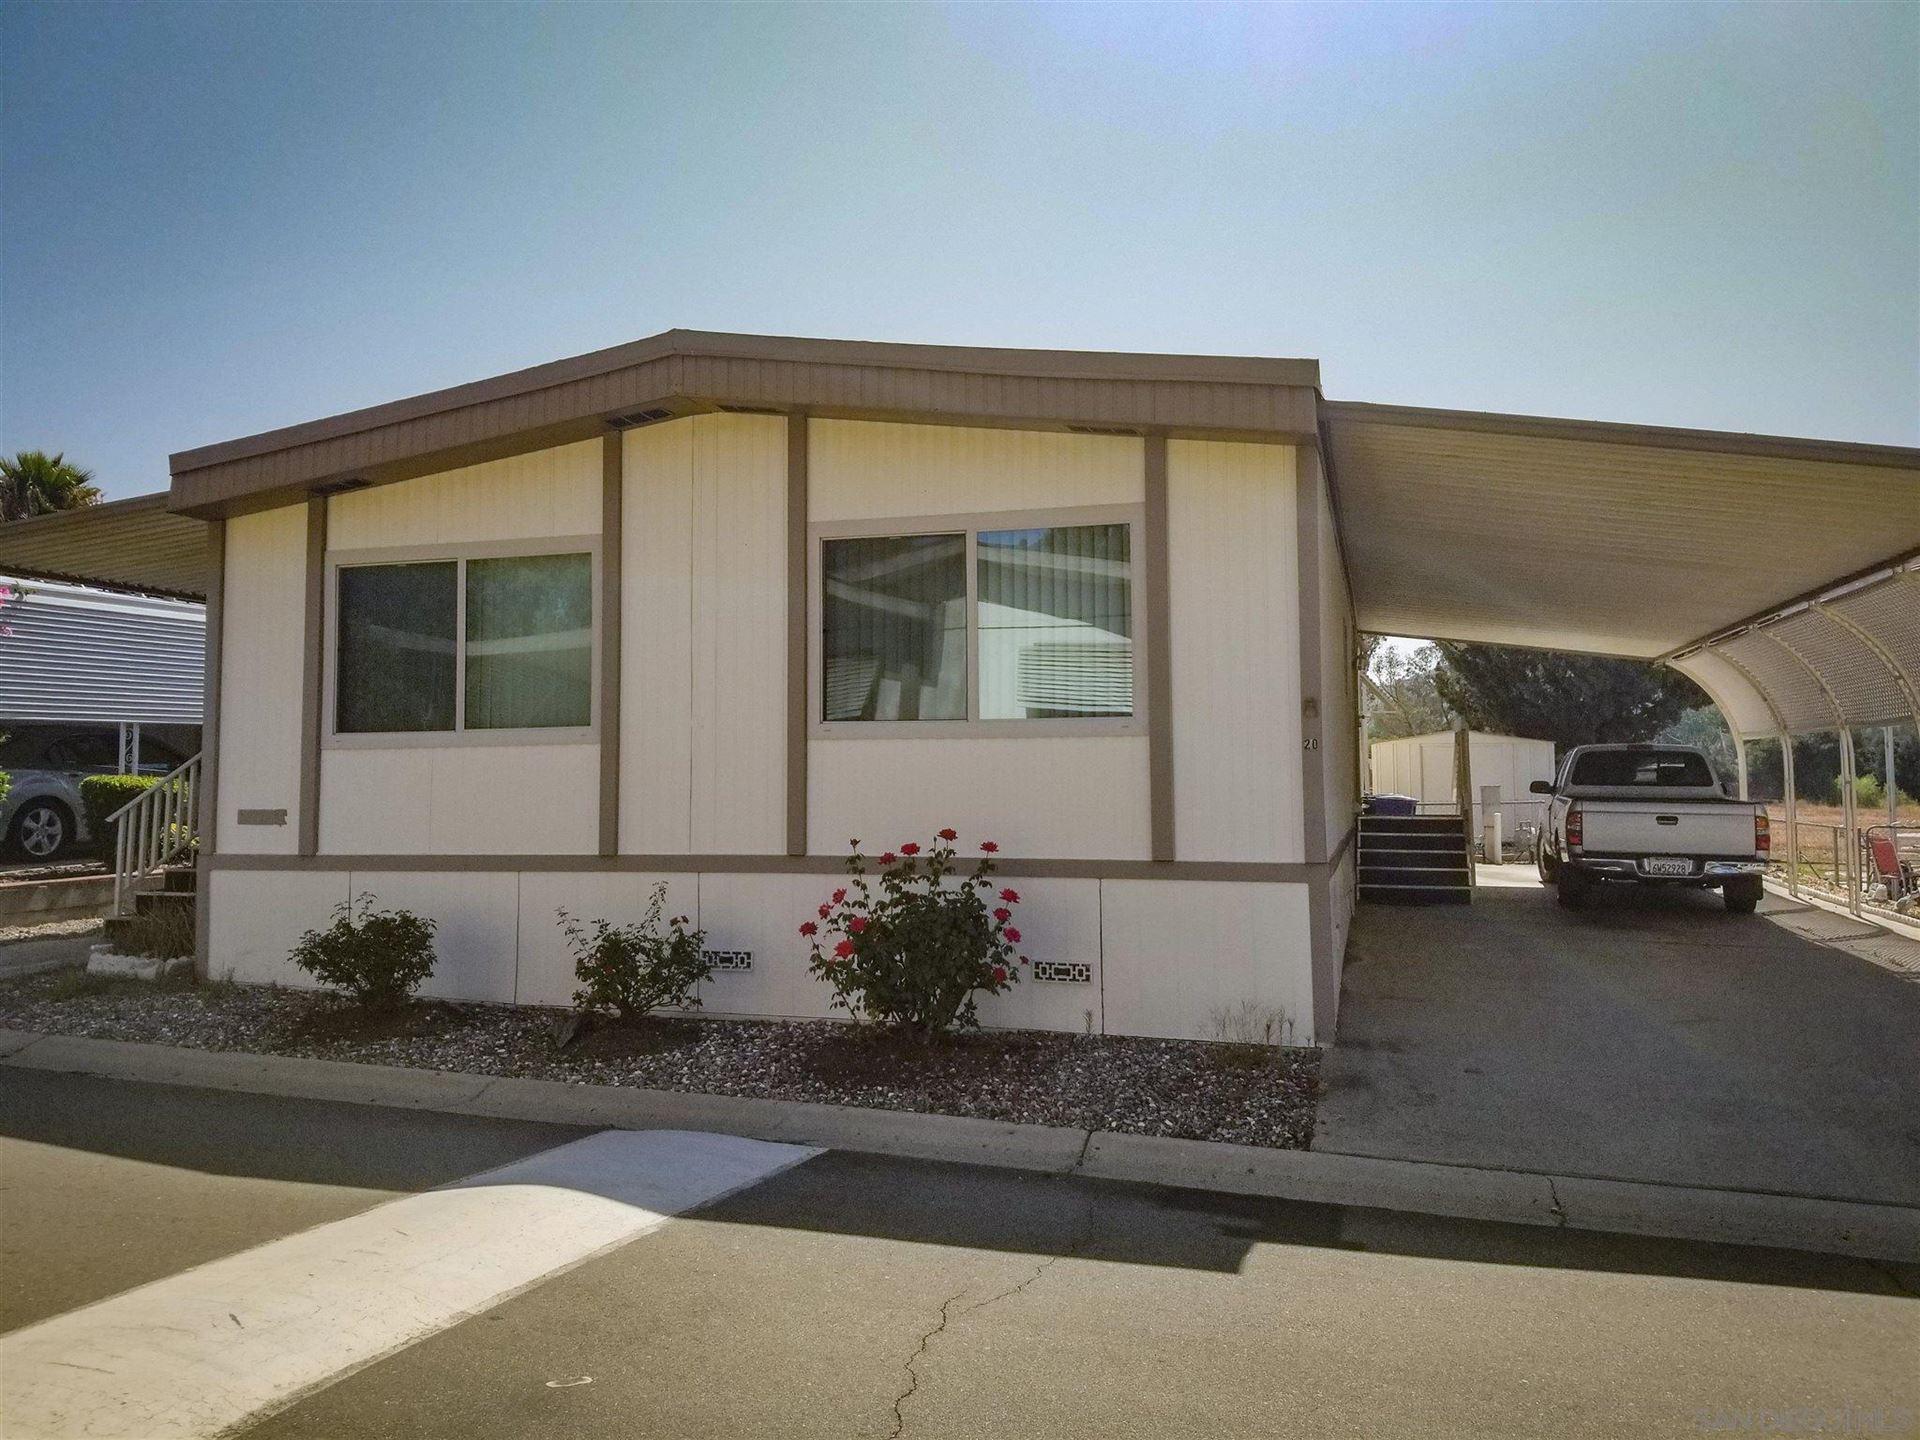 Photo of 15420 Olde Hwy 80 #SPC 20, El Cajon, CA 92021 (MLS # 210021510)